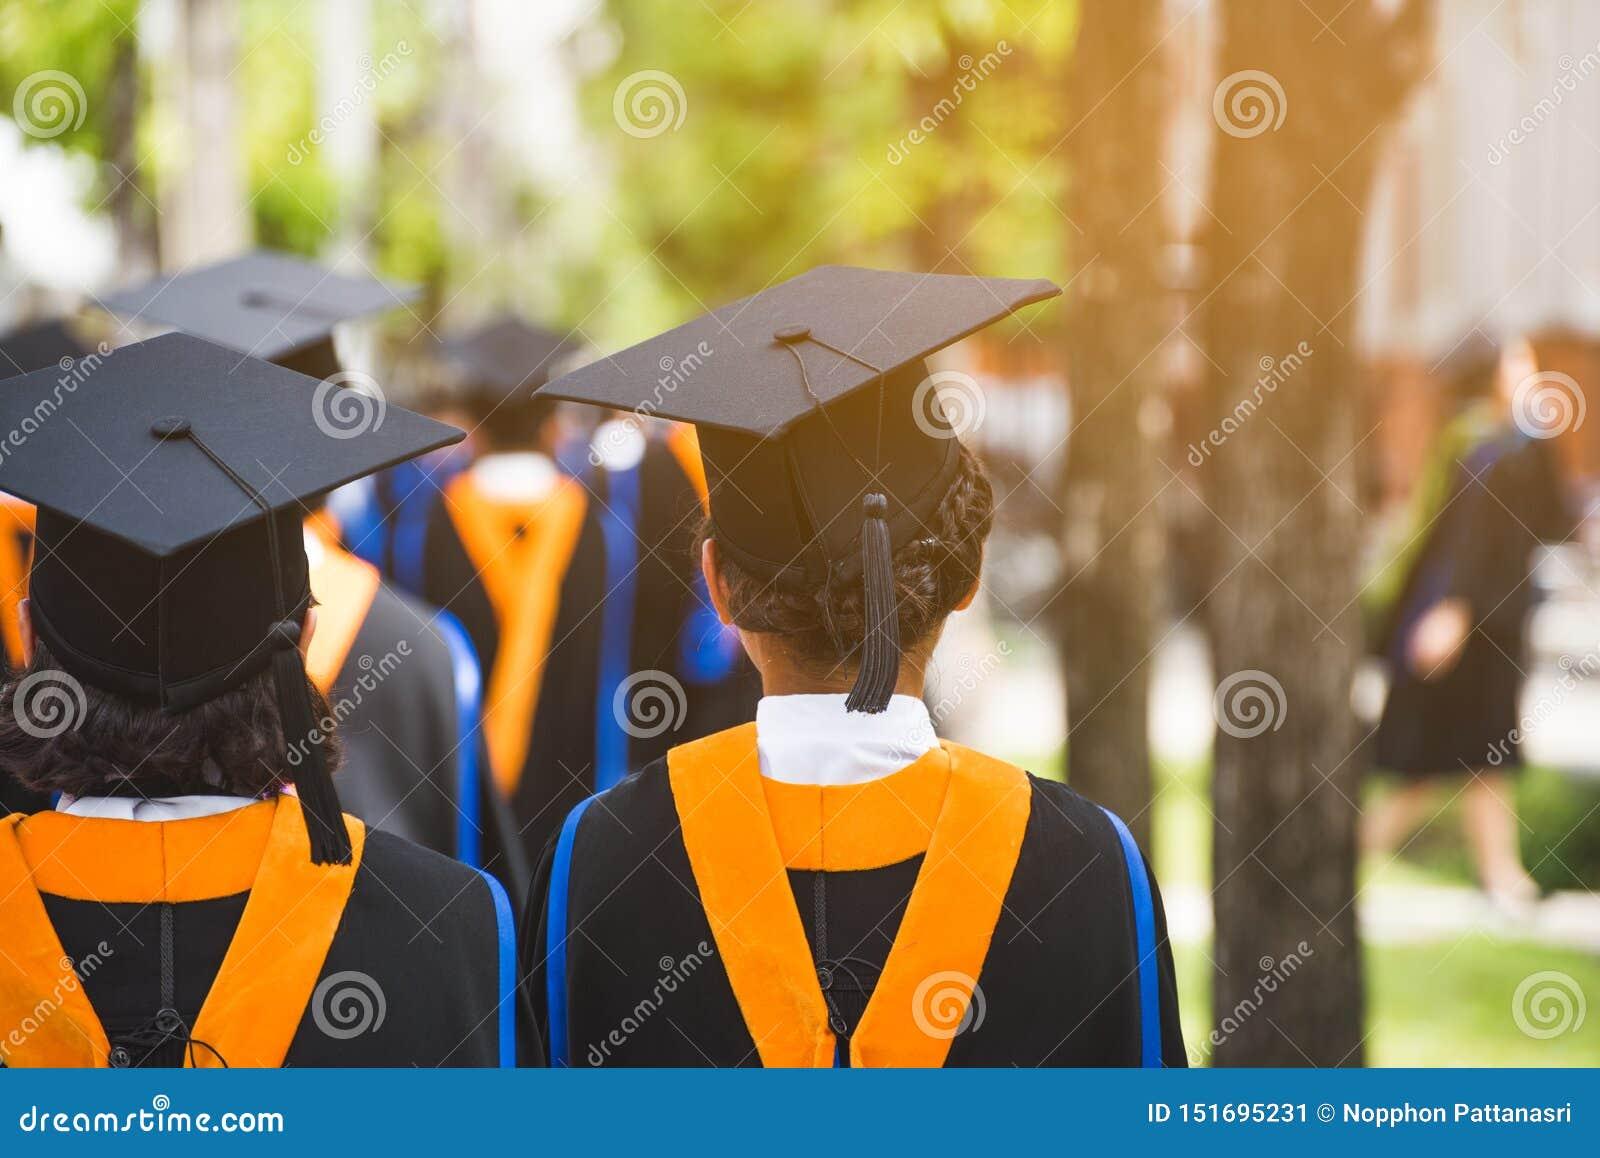 Grupo de graduados durante o come?o Felicita??es da educa??o do conceito na universidade